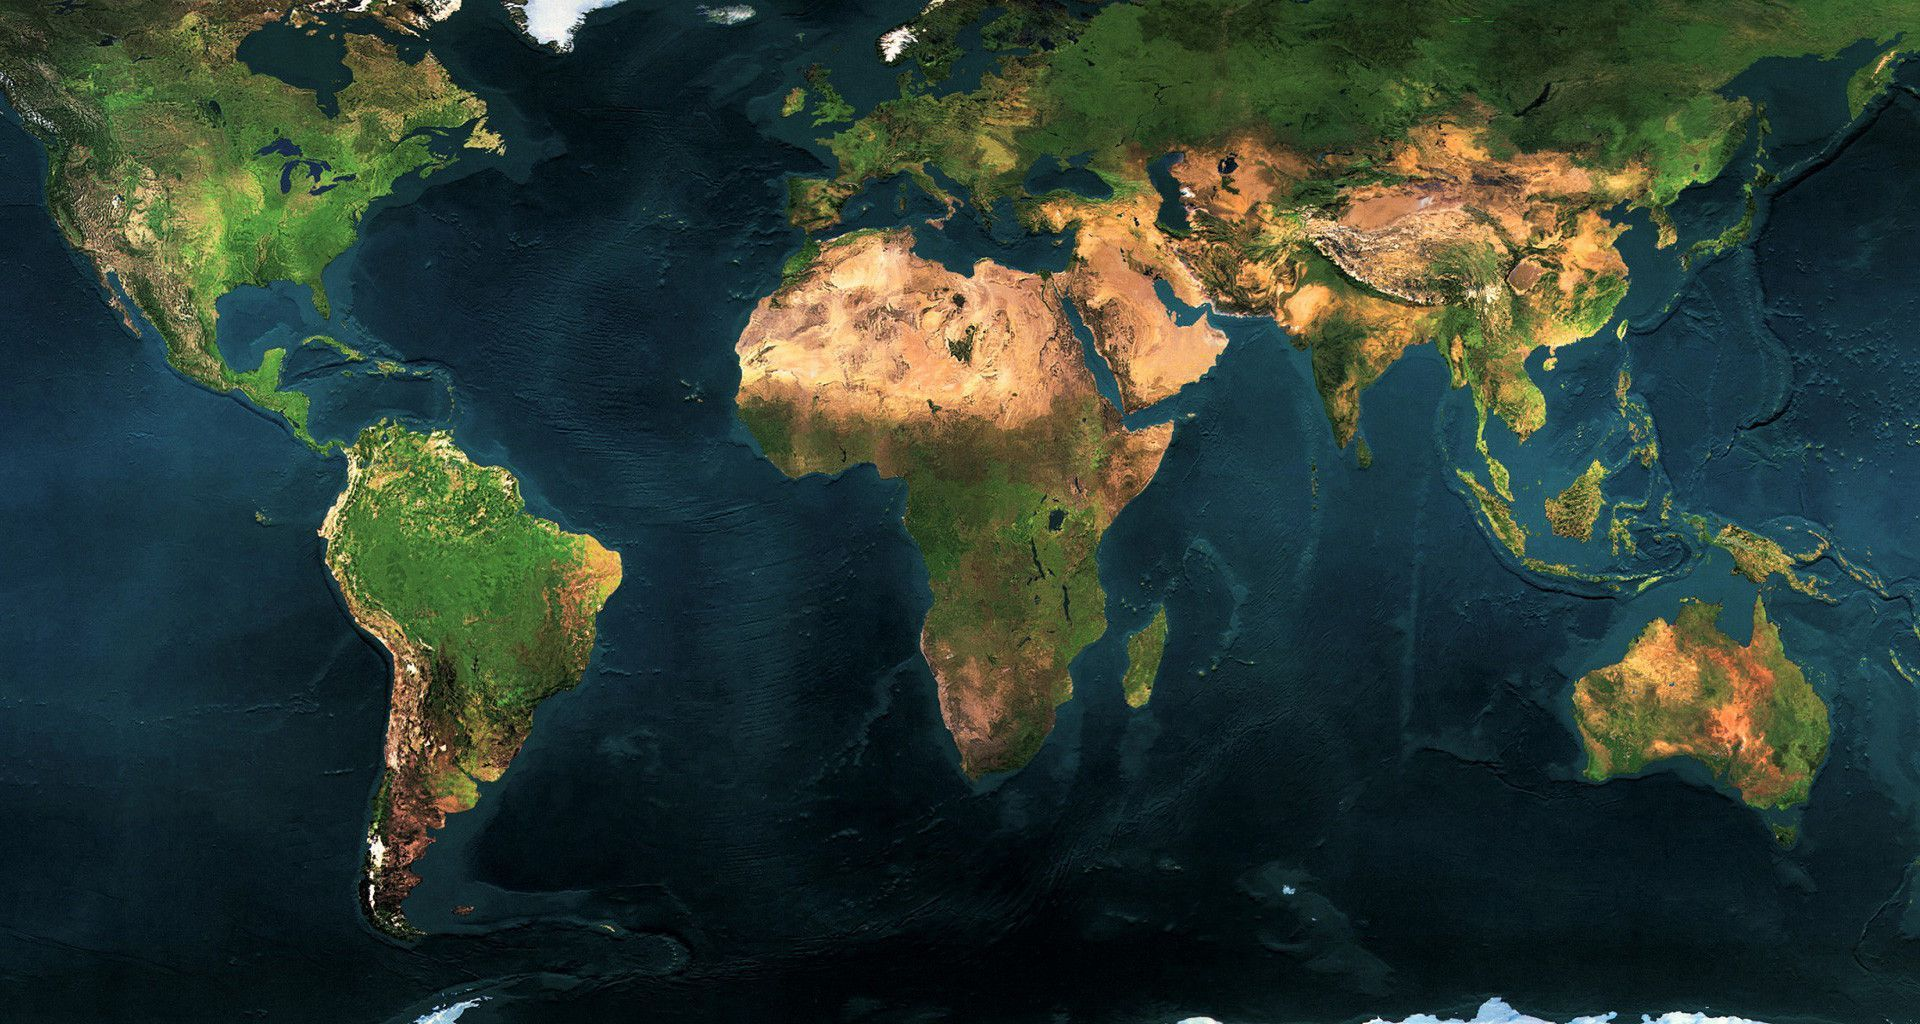 world map wallpaper Google Search world